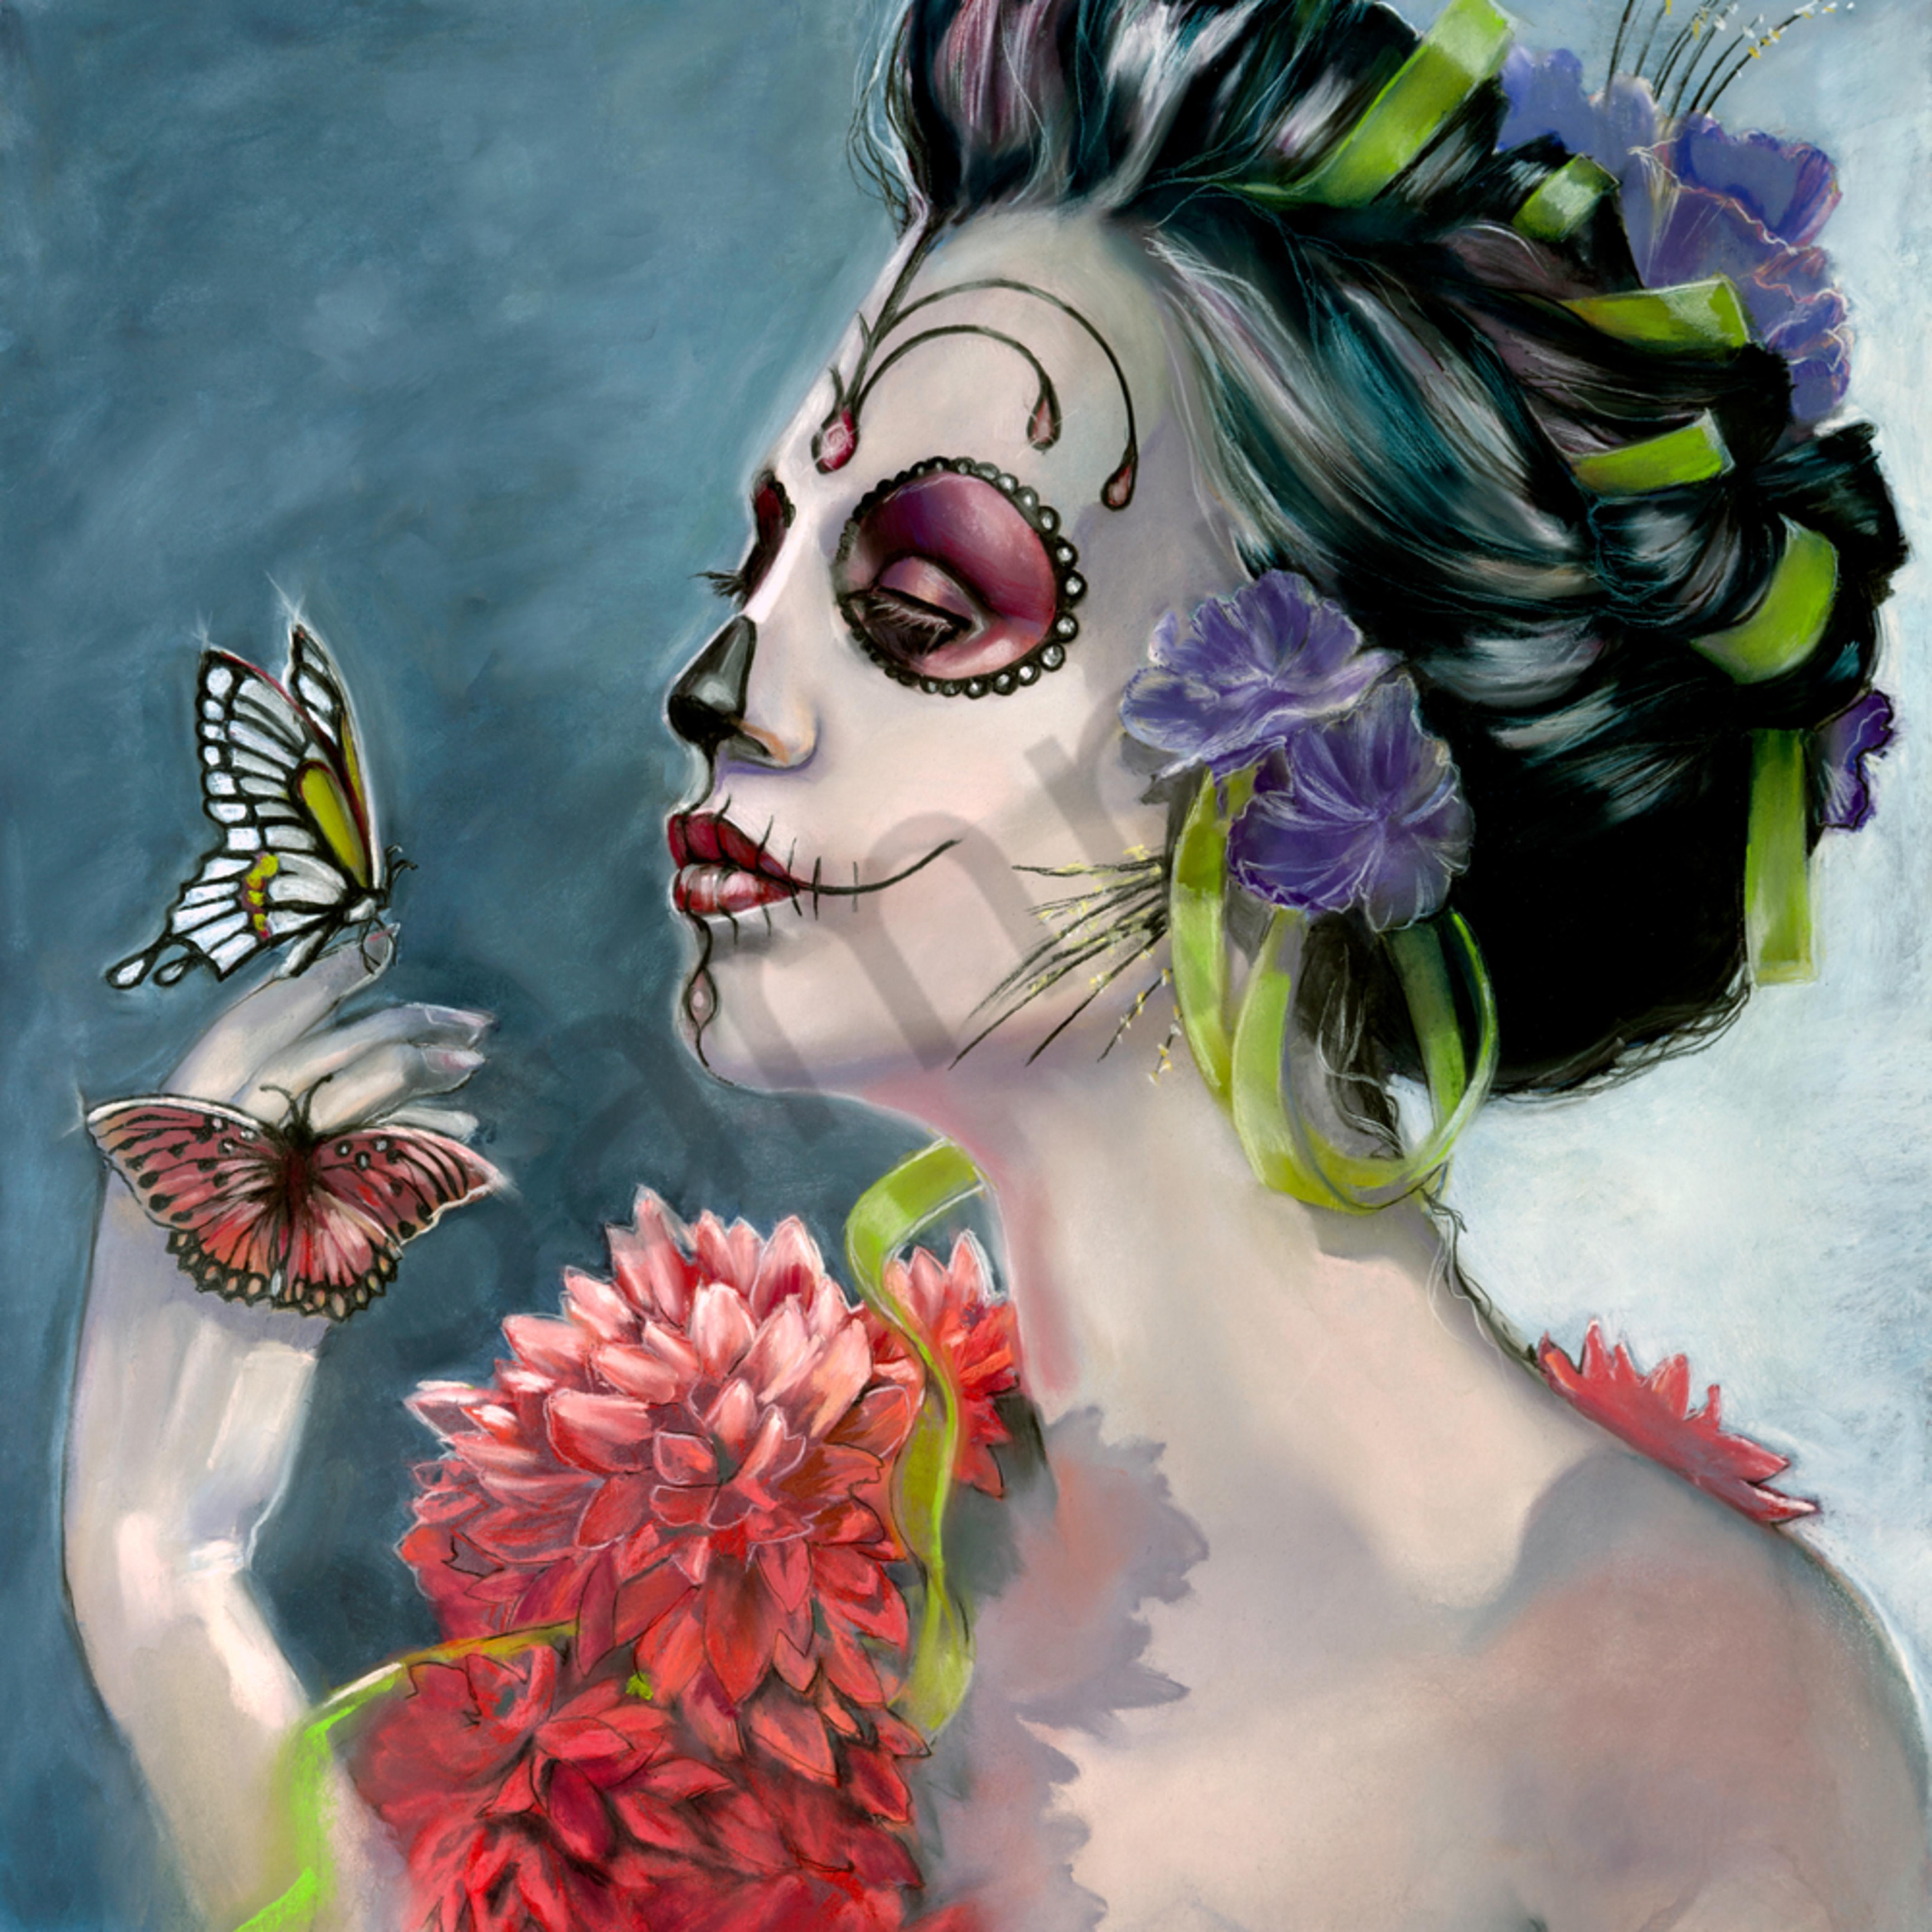 Monarch katrina jpeg 18x18 qlee5i